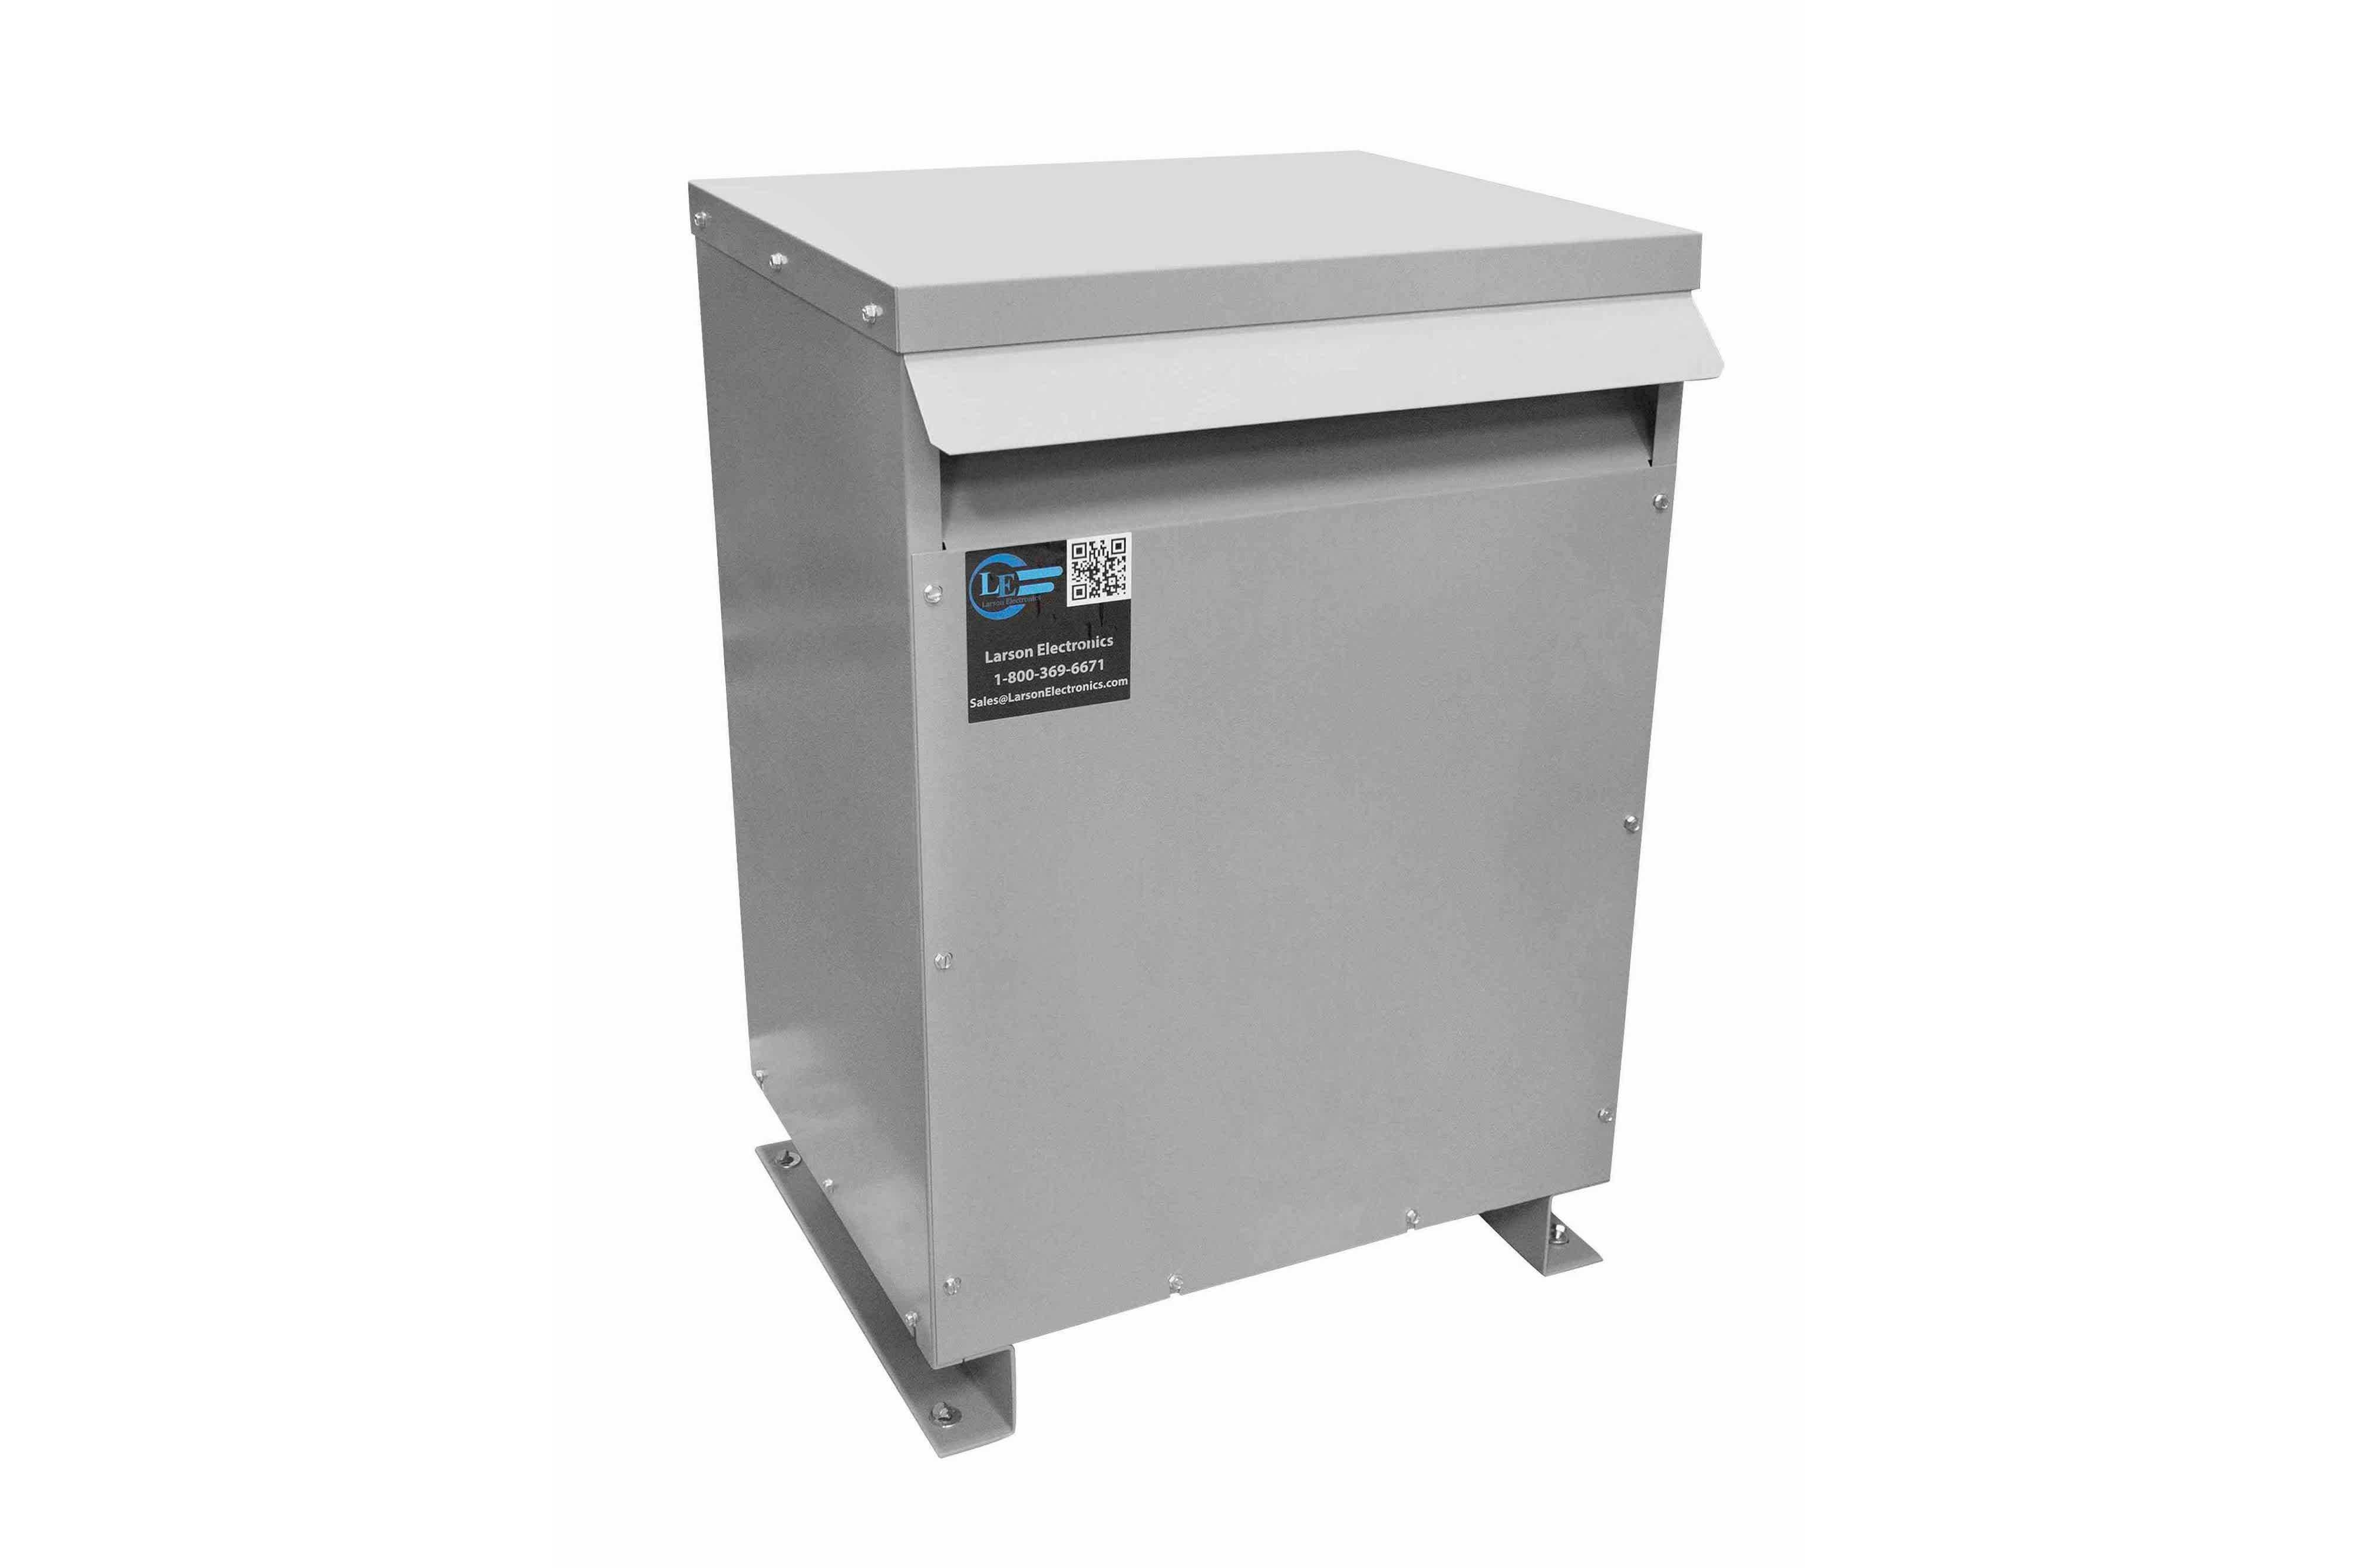 225 kVA 3PH Isolation Transformer, 480V Wye Primary, 415V Delta Secondary, N3R, Ventilated, 60 Hz